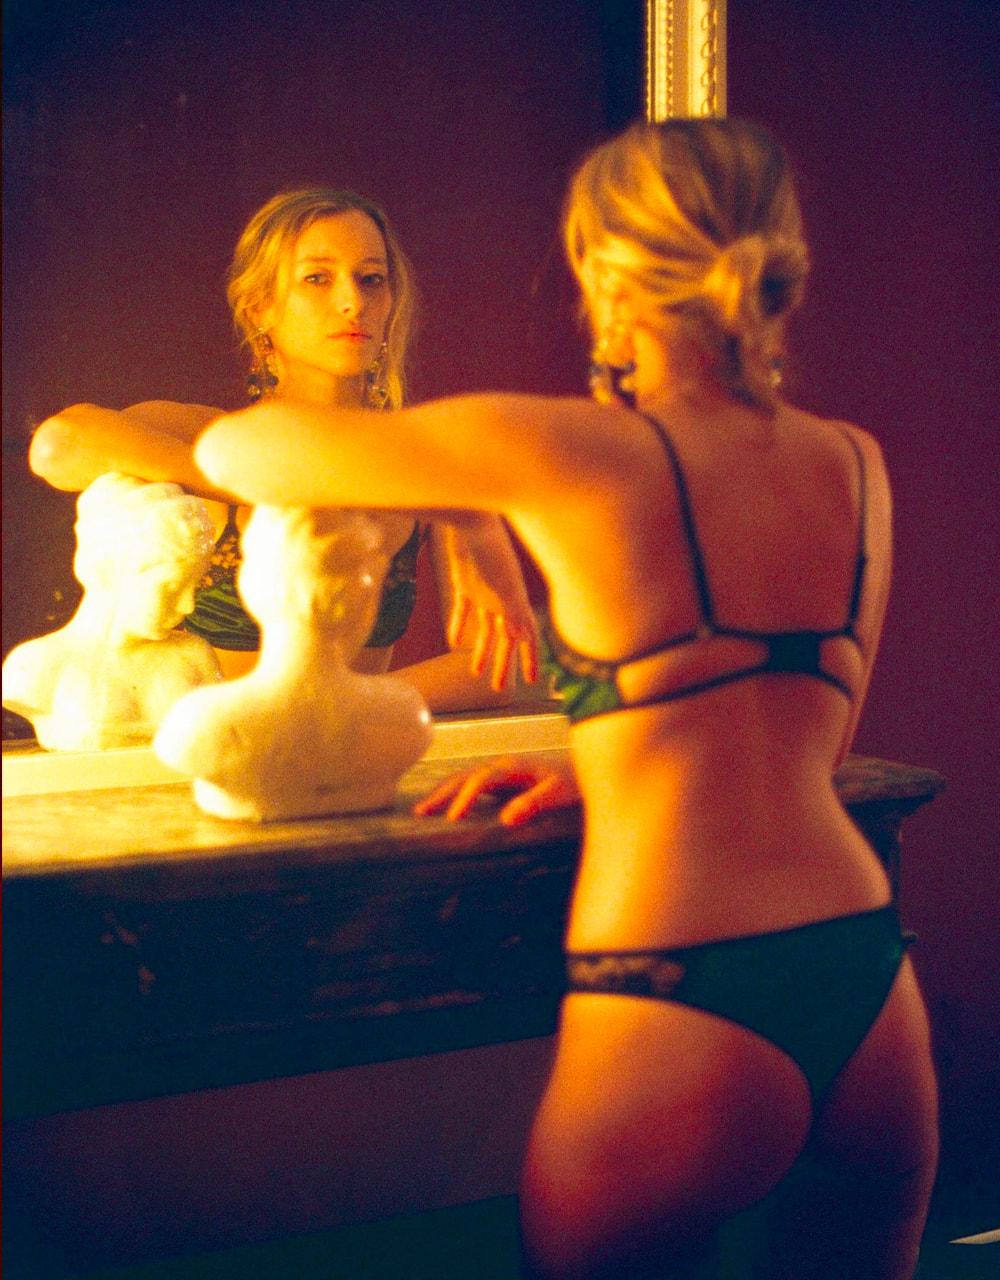 lingerie bra without underwires Very Velvet Green Queen 34 € Girls In Paris photo 4